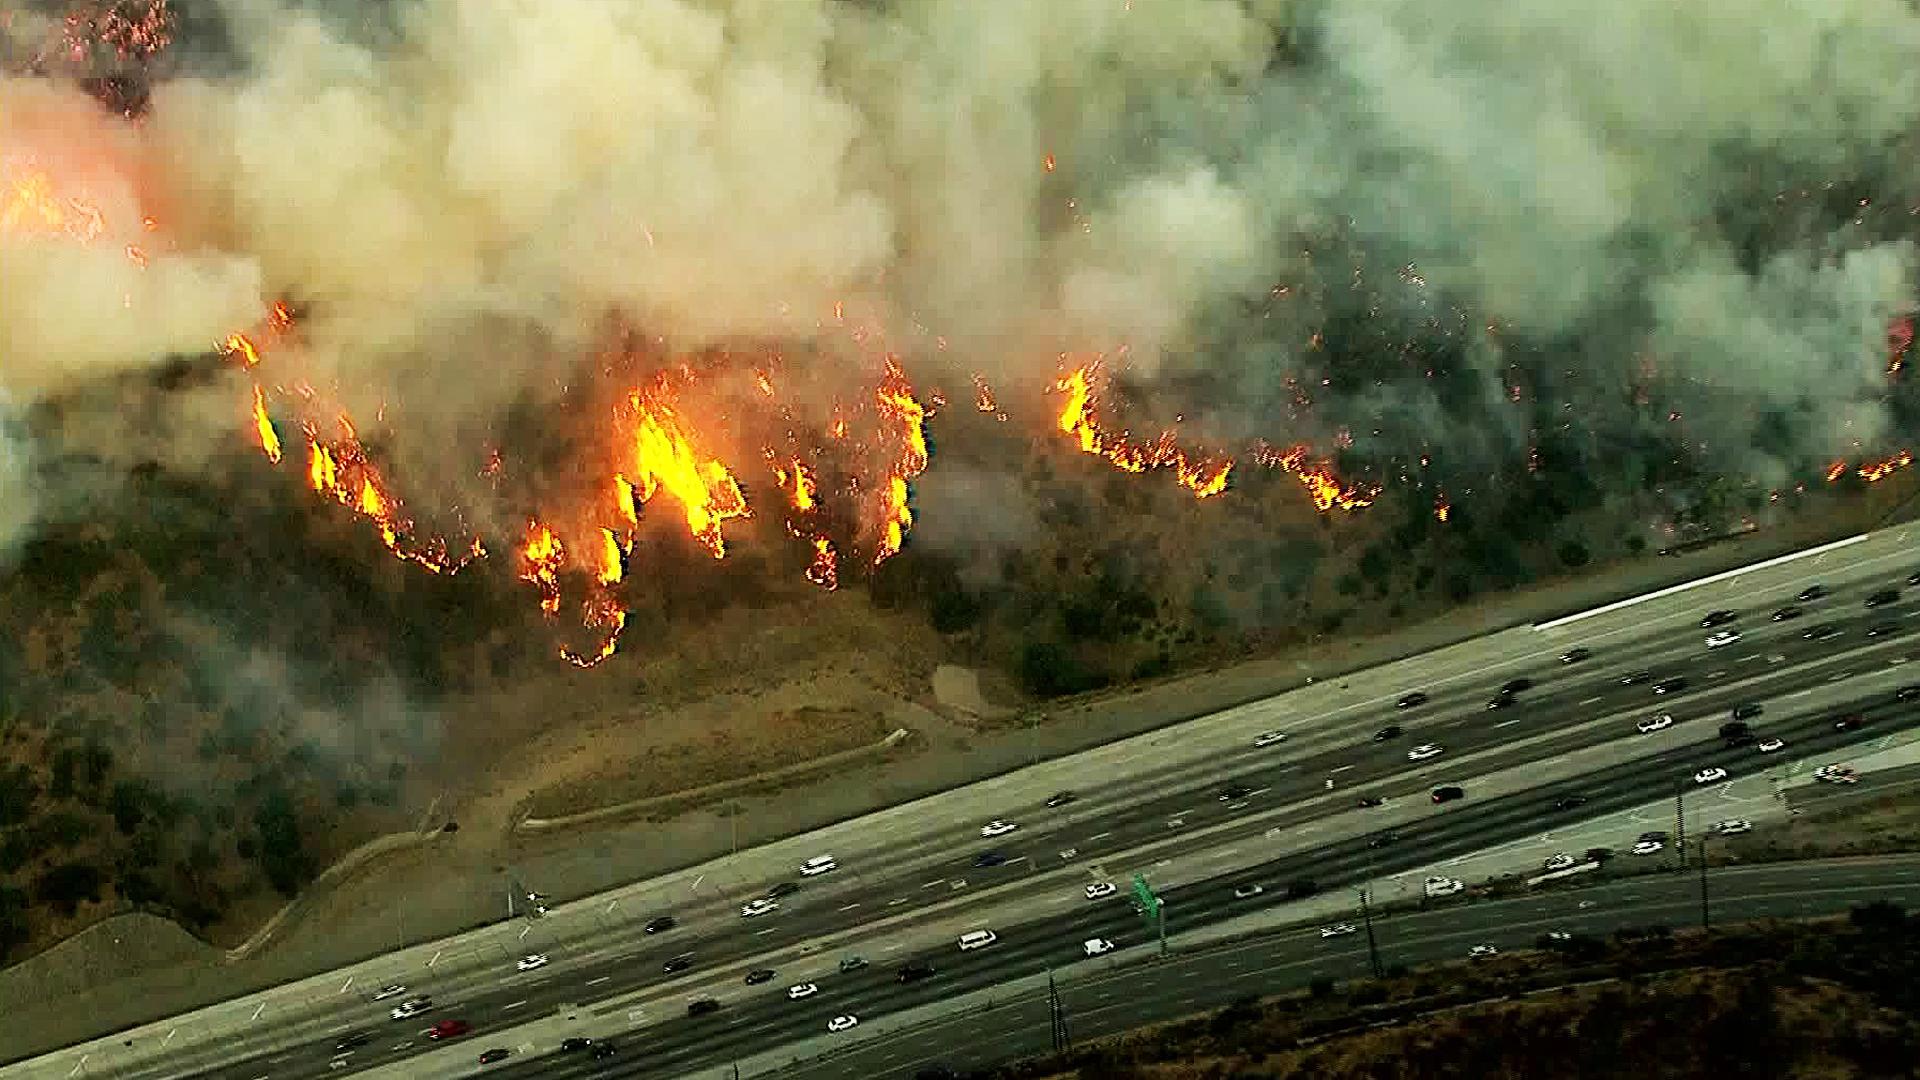 The Getty Fire burns near the 405 Freeway on Oct. 28, 2019. (Credit: KTLA)